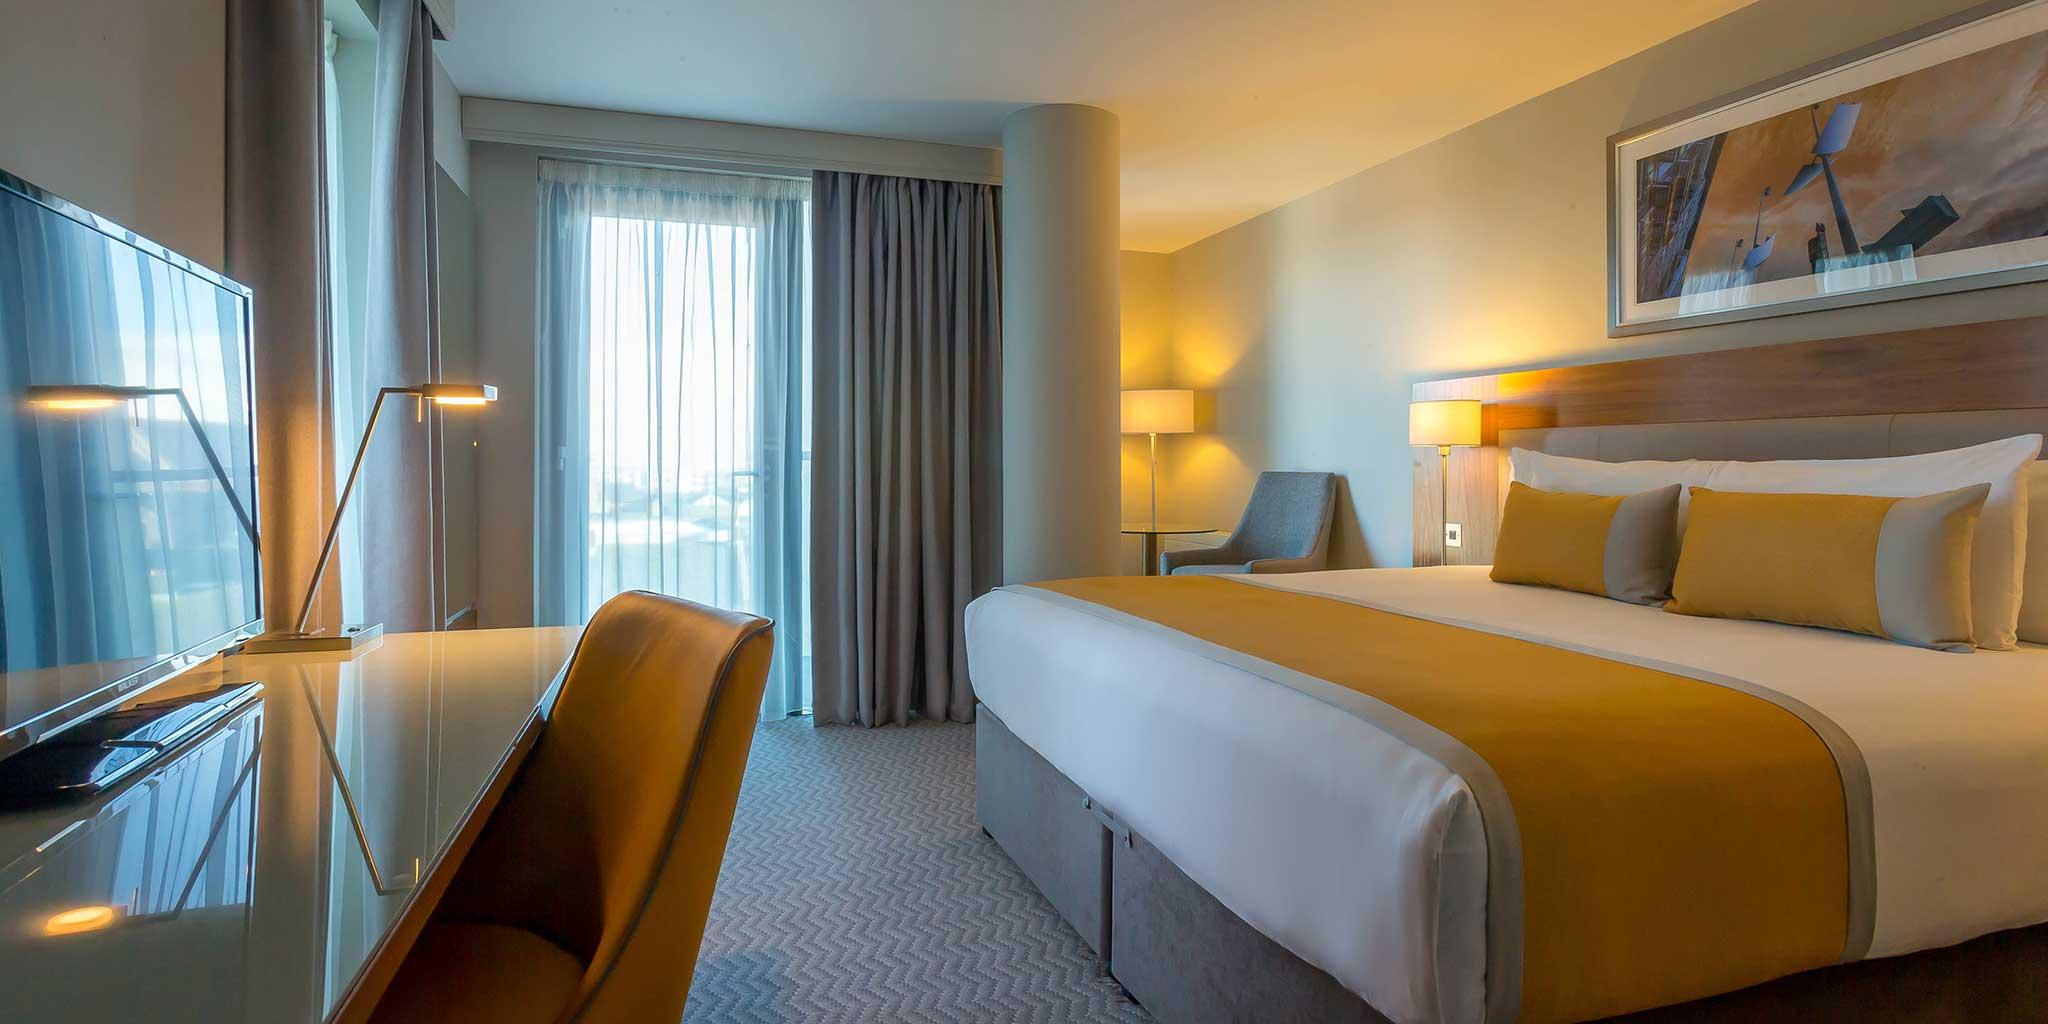 Comfy Double Room at Maldron Hotel Smithfield